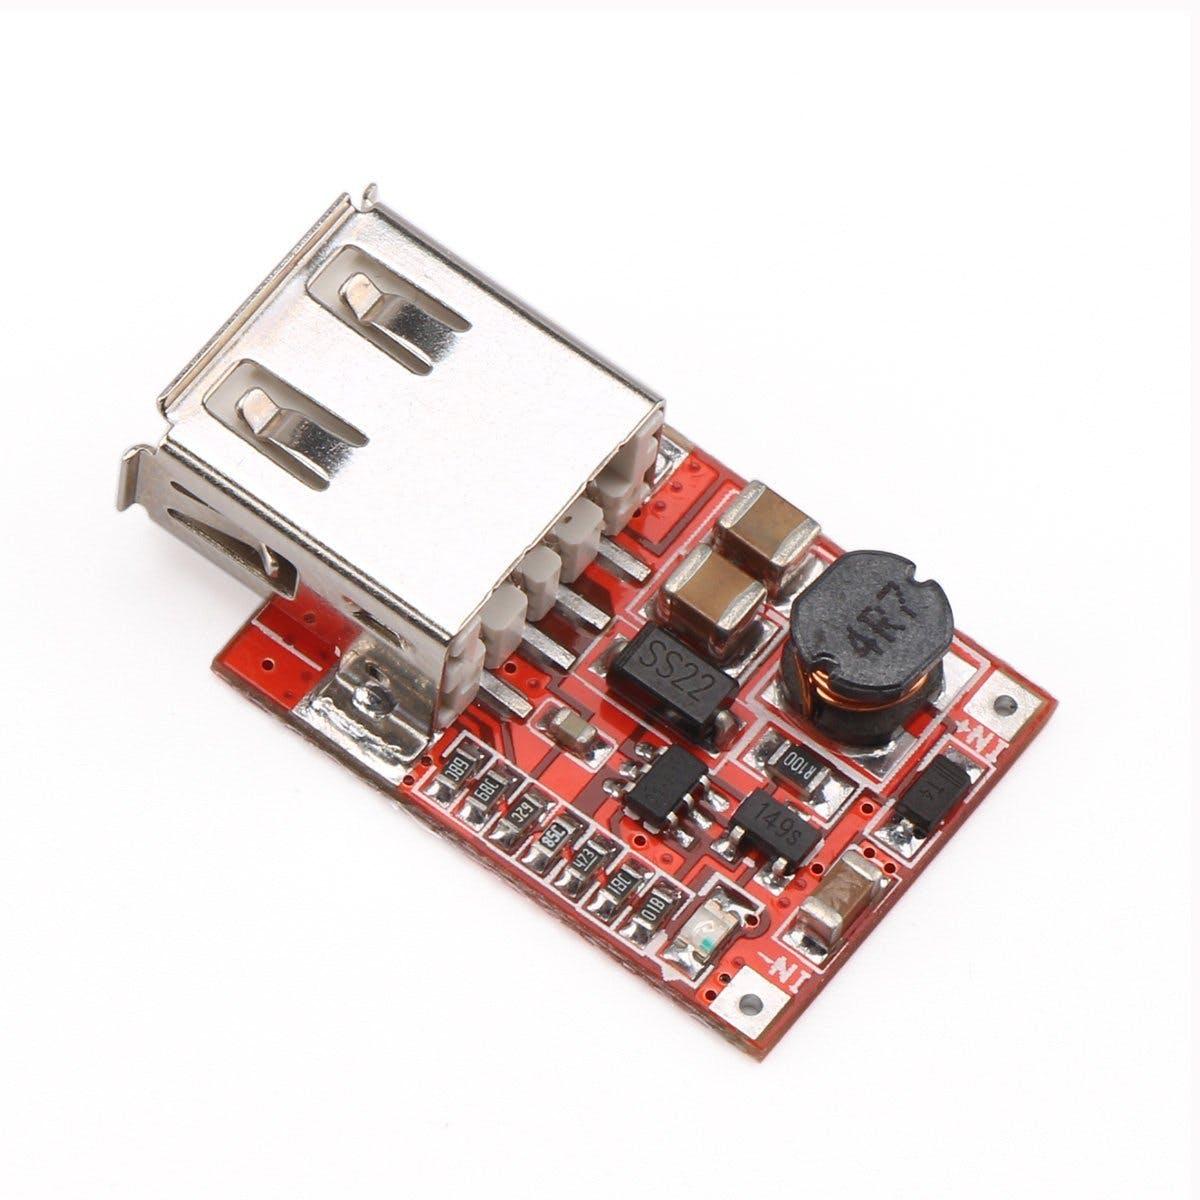 5V USB Charging Port